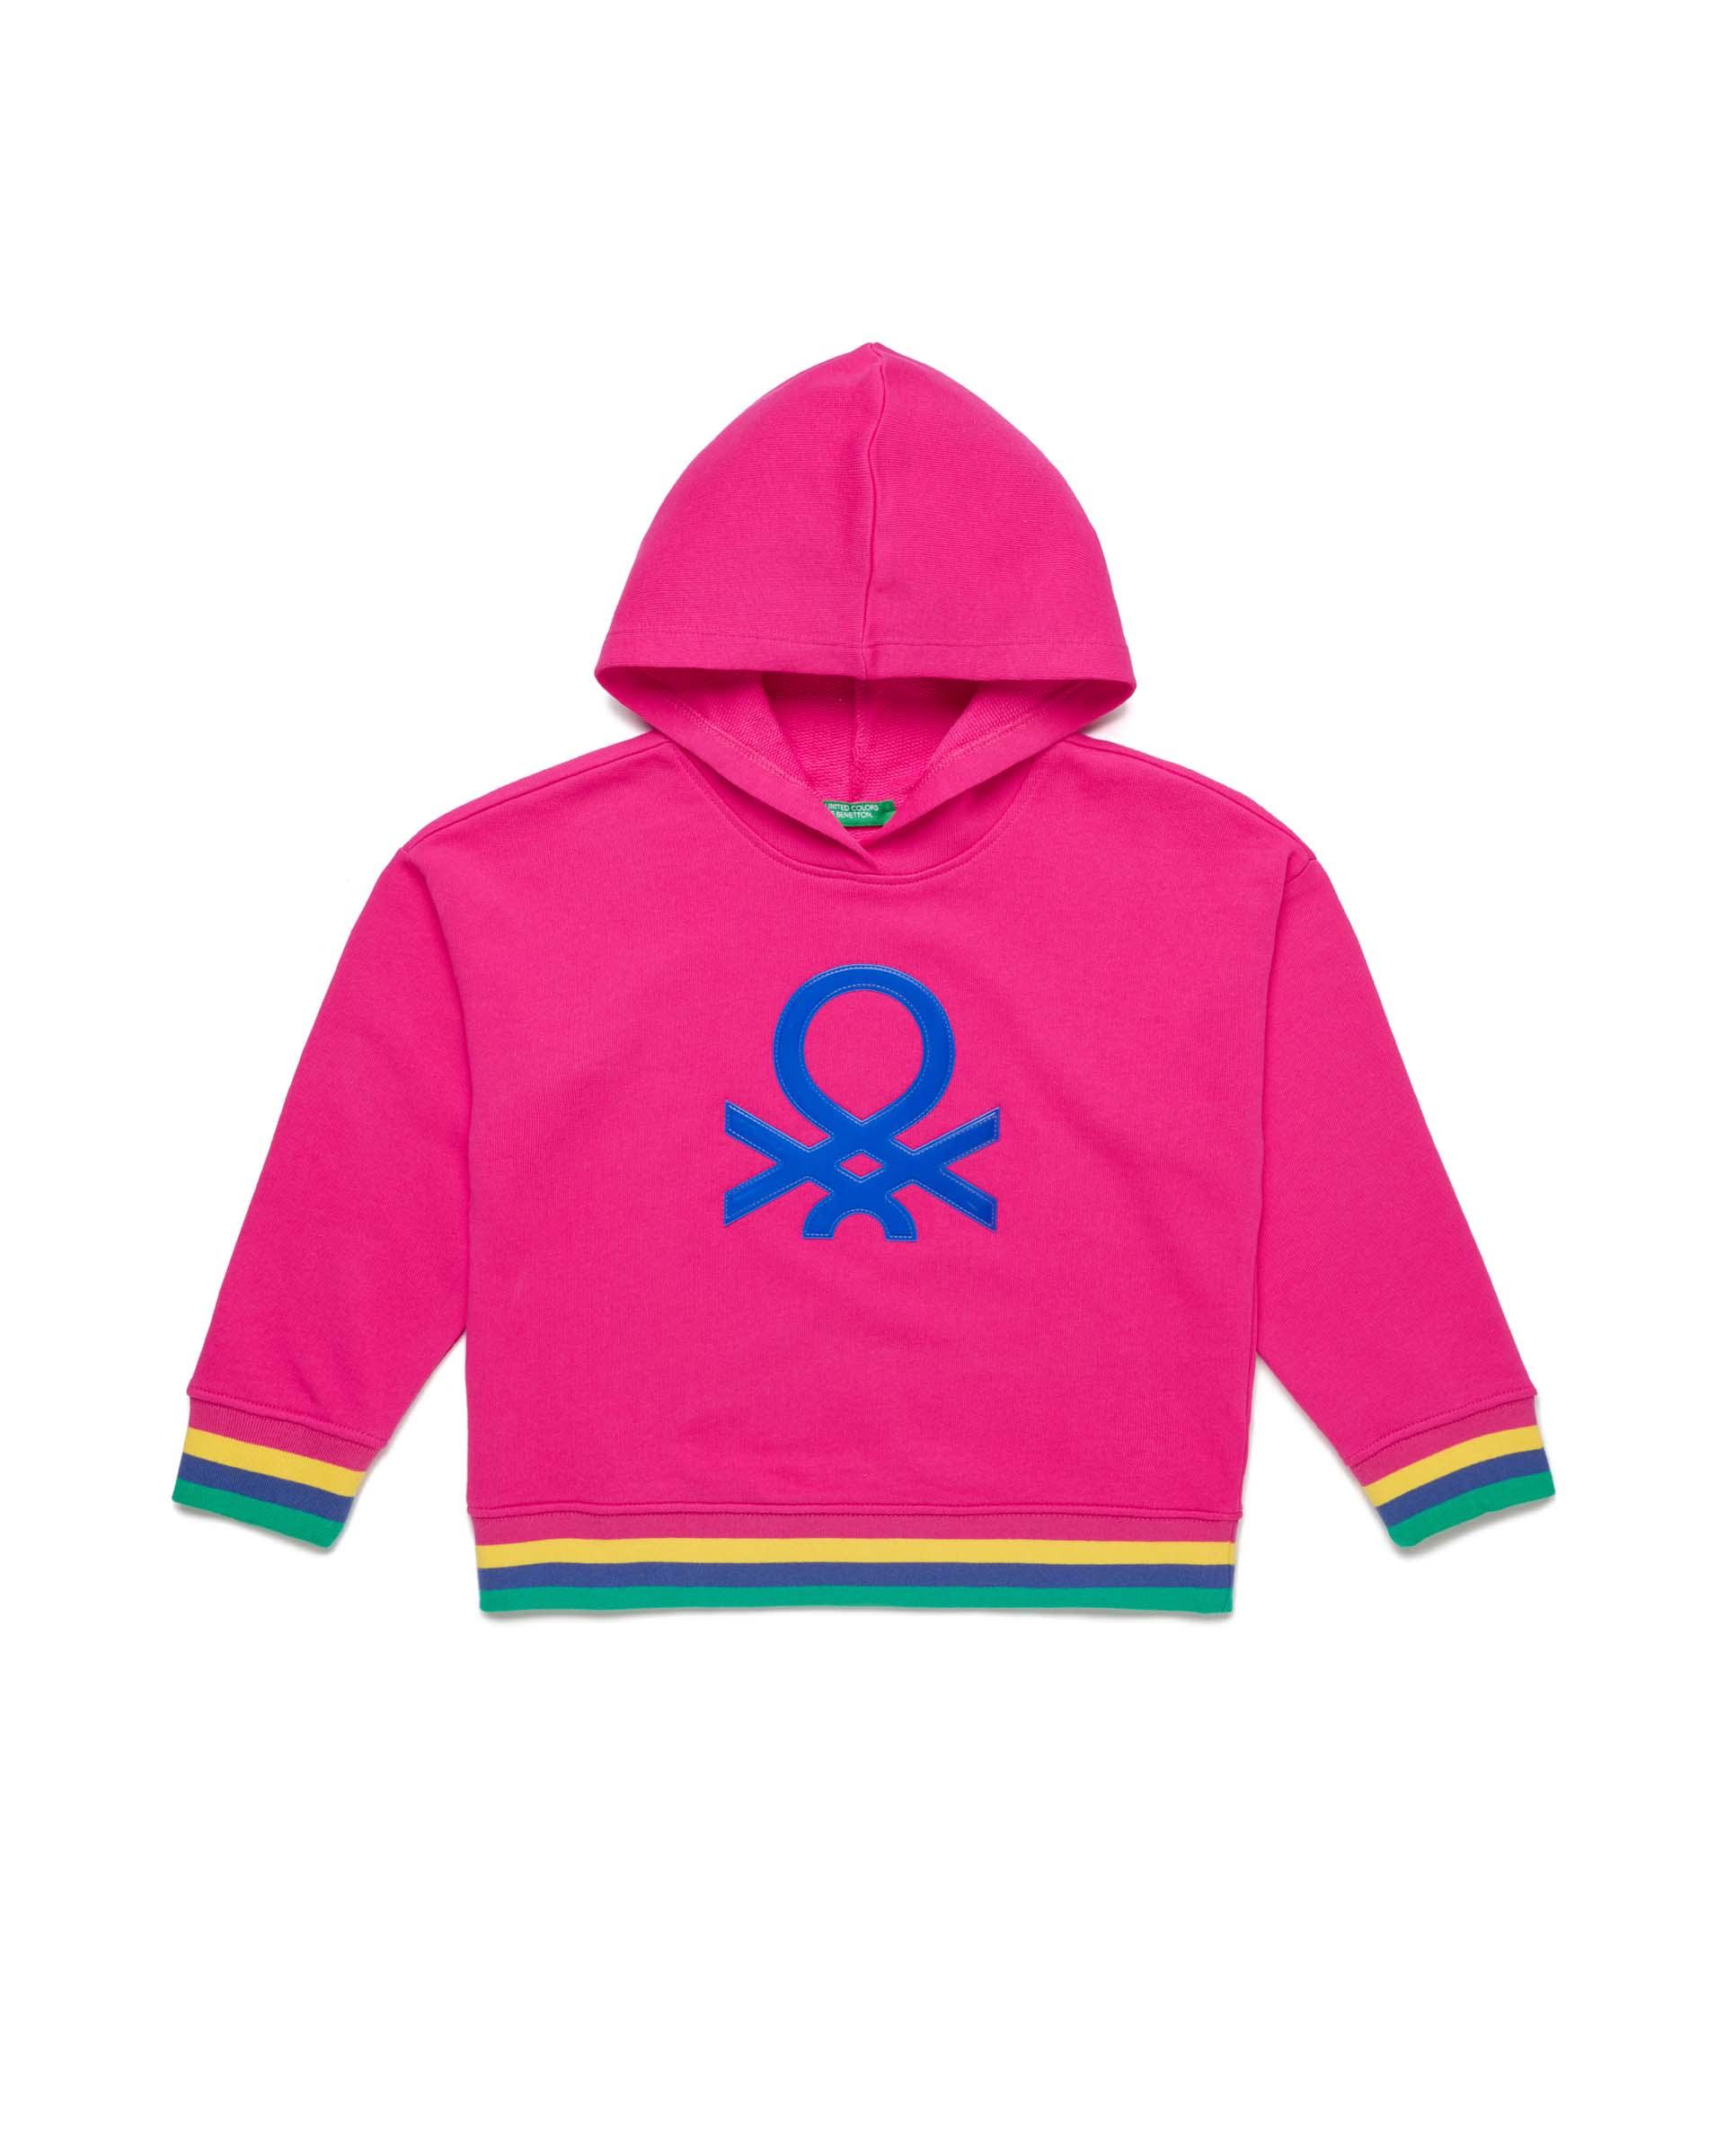 Купить 20P_3J68C2175_2L3, Толстовка для девочек Benetton 3J68C2175_2L3 р-р 158, United Colors of Benetton, Толстовки для девочек